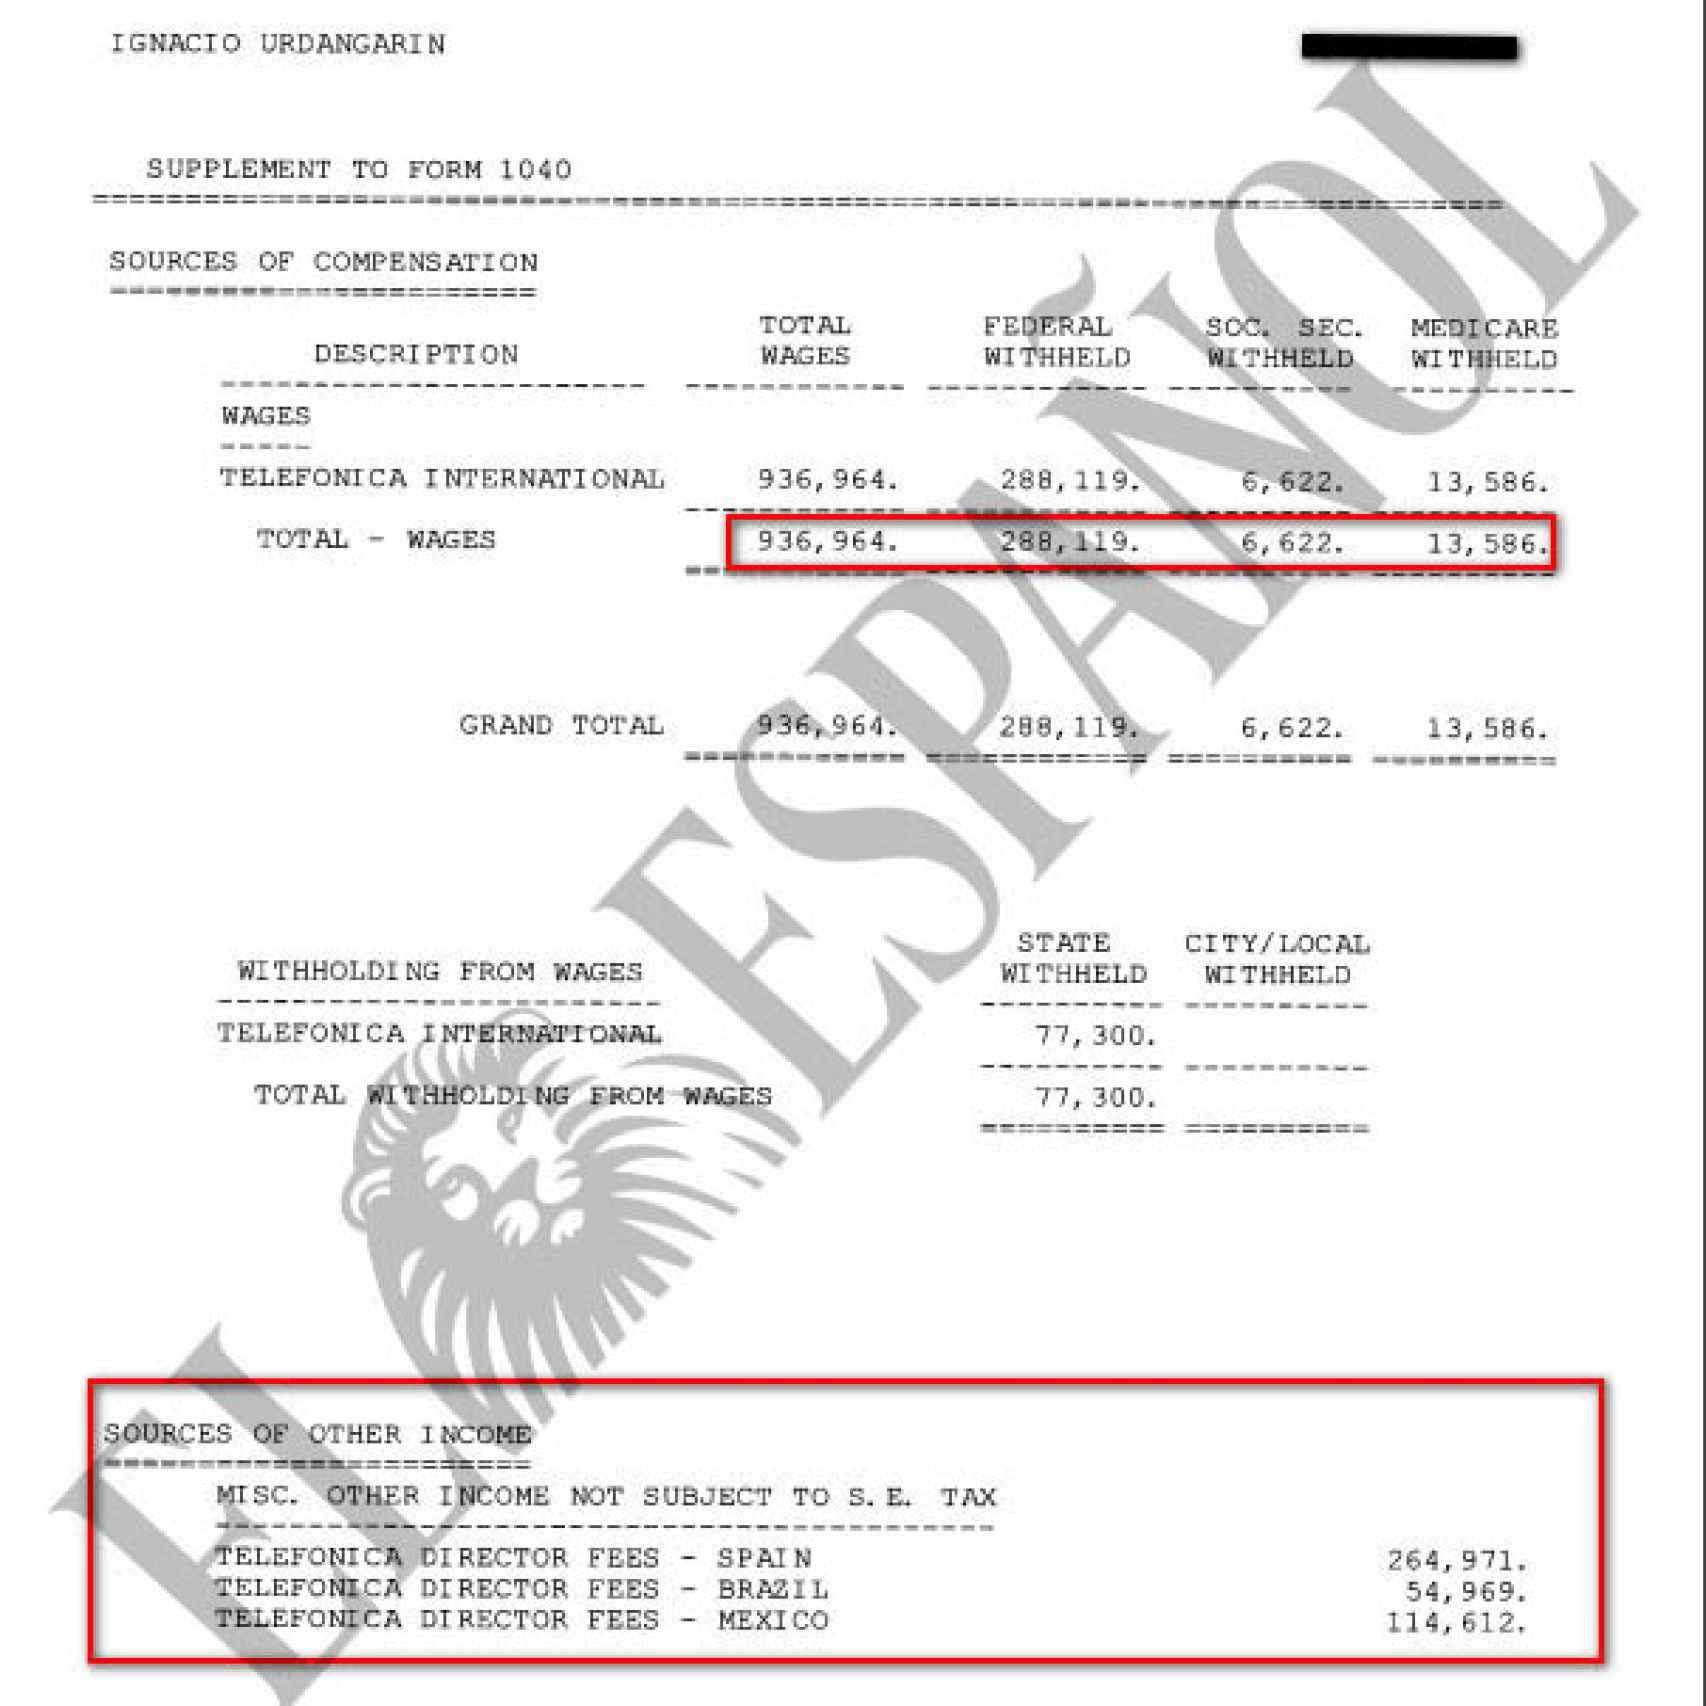 Registro de ingresos cobrados por Iñaki Urdangarin de Telefónica en 2010.